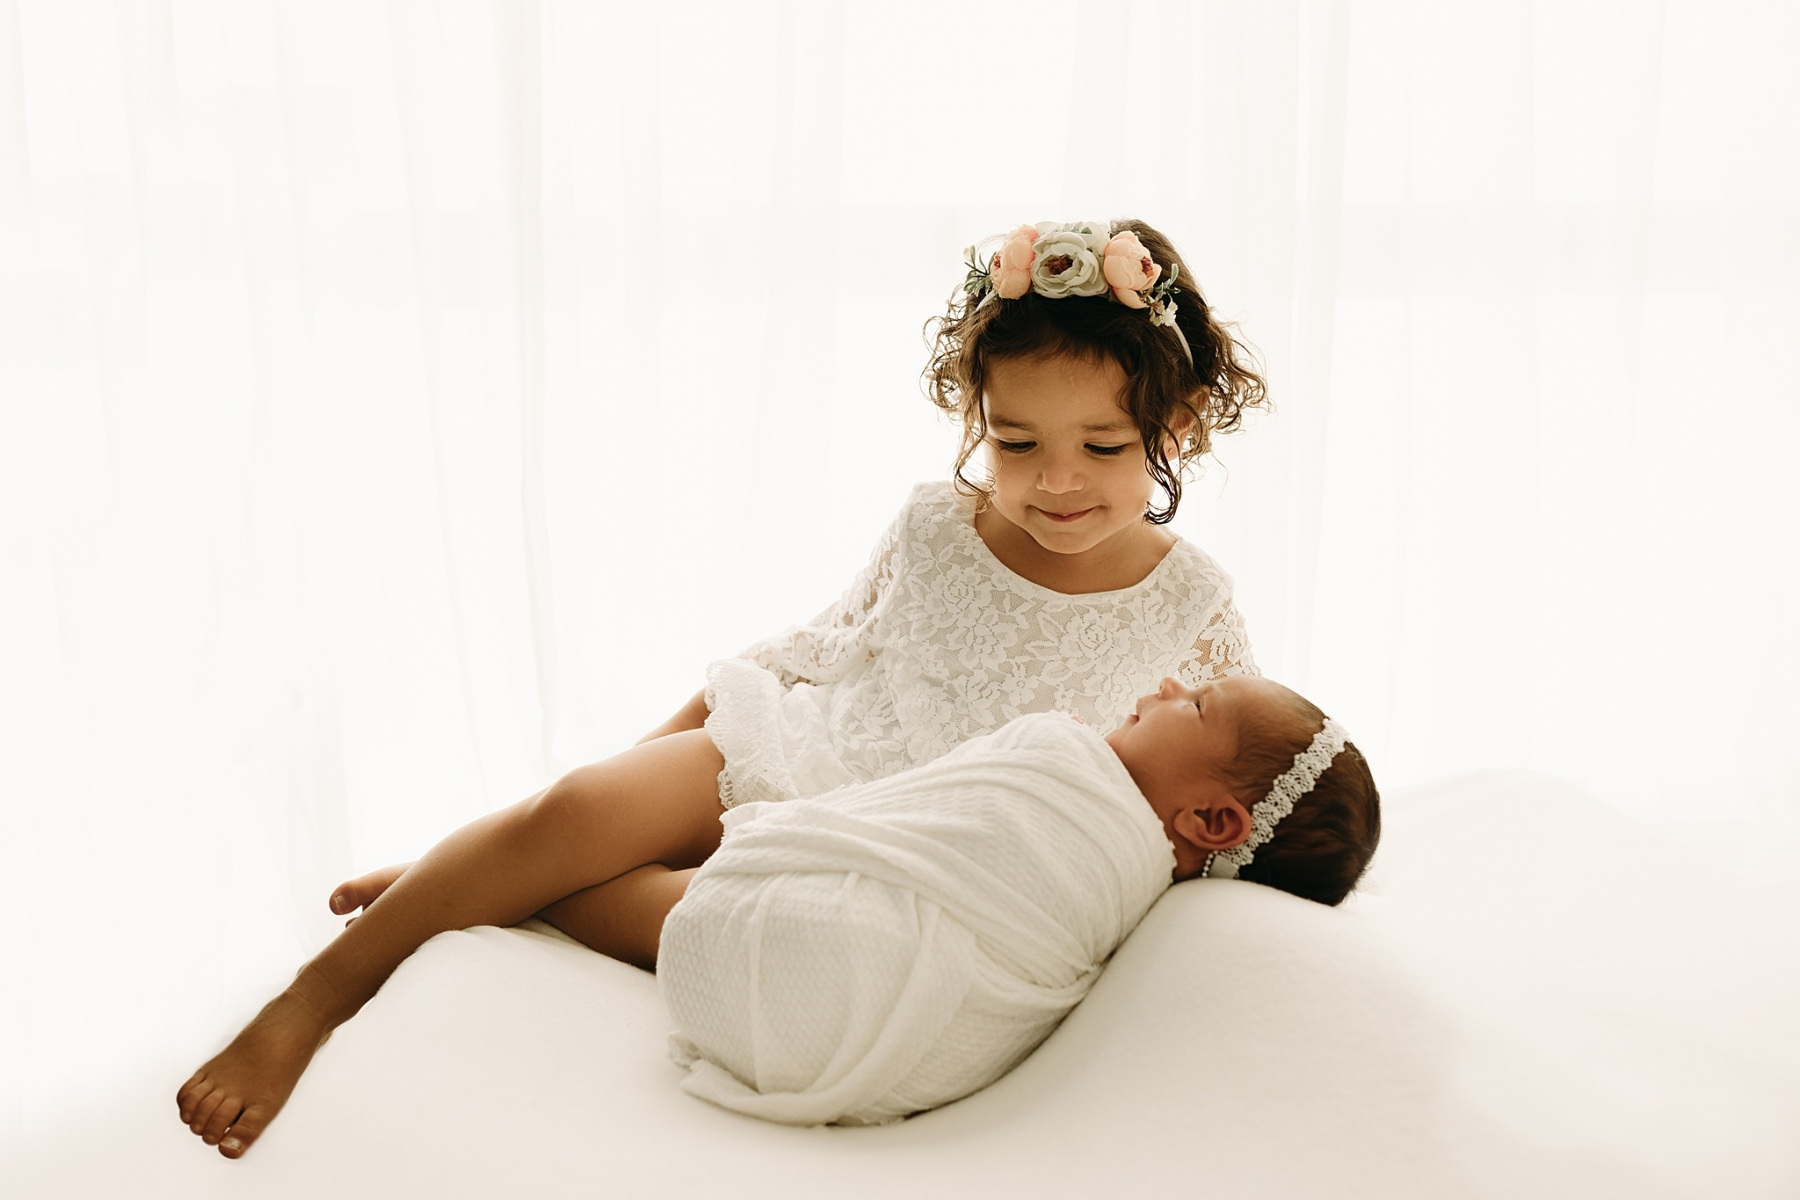 sibling newborn photo backlit on white